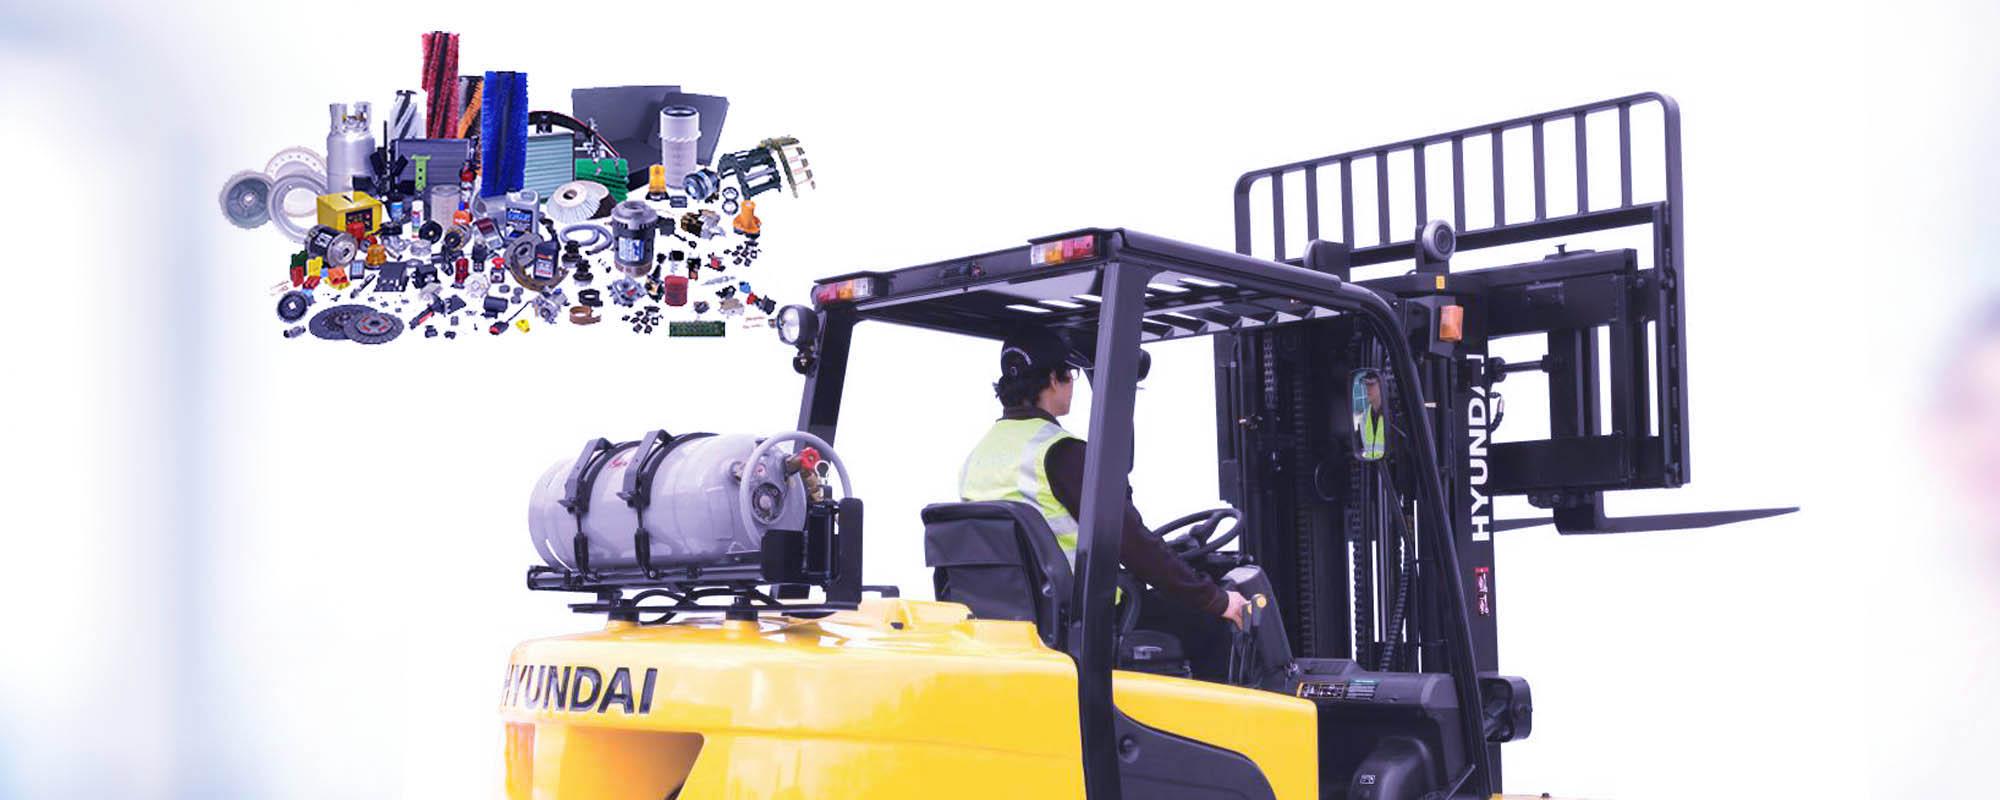 Forklift <span>Spare Parts</span> in <span>Dubai</span>